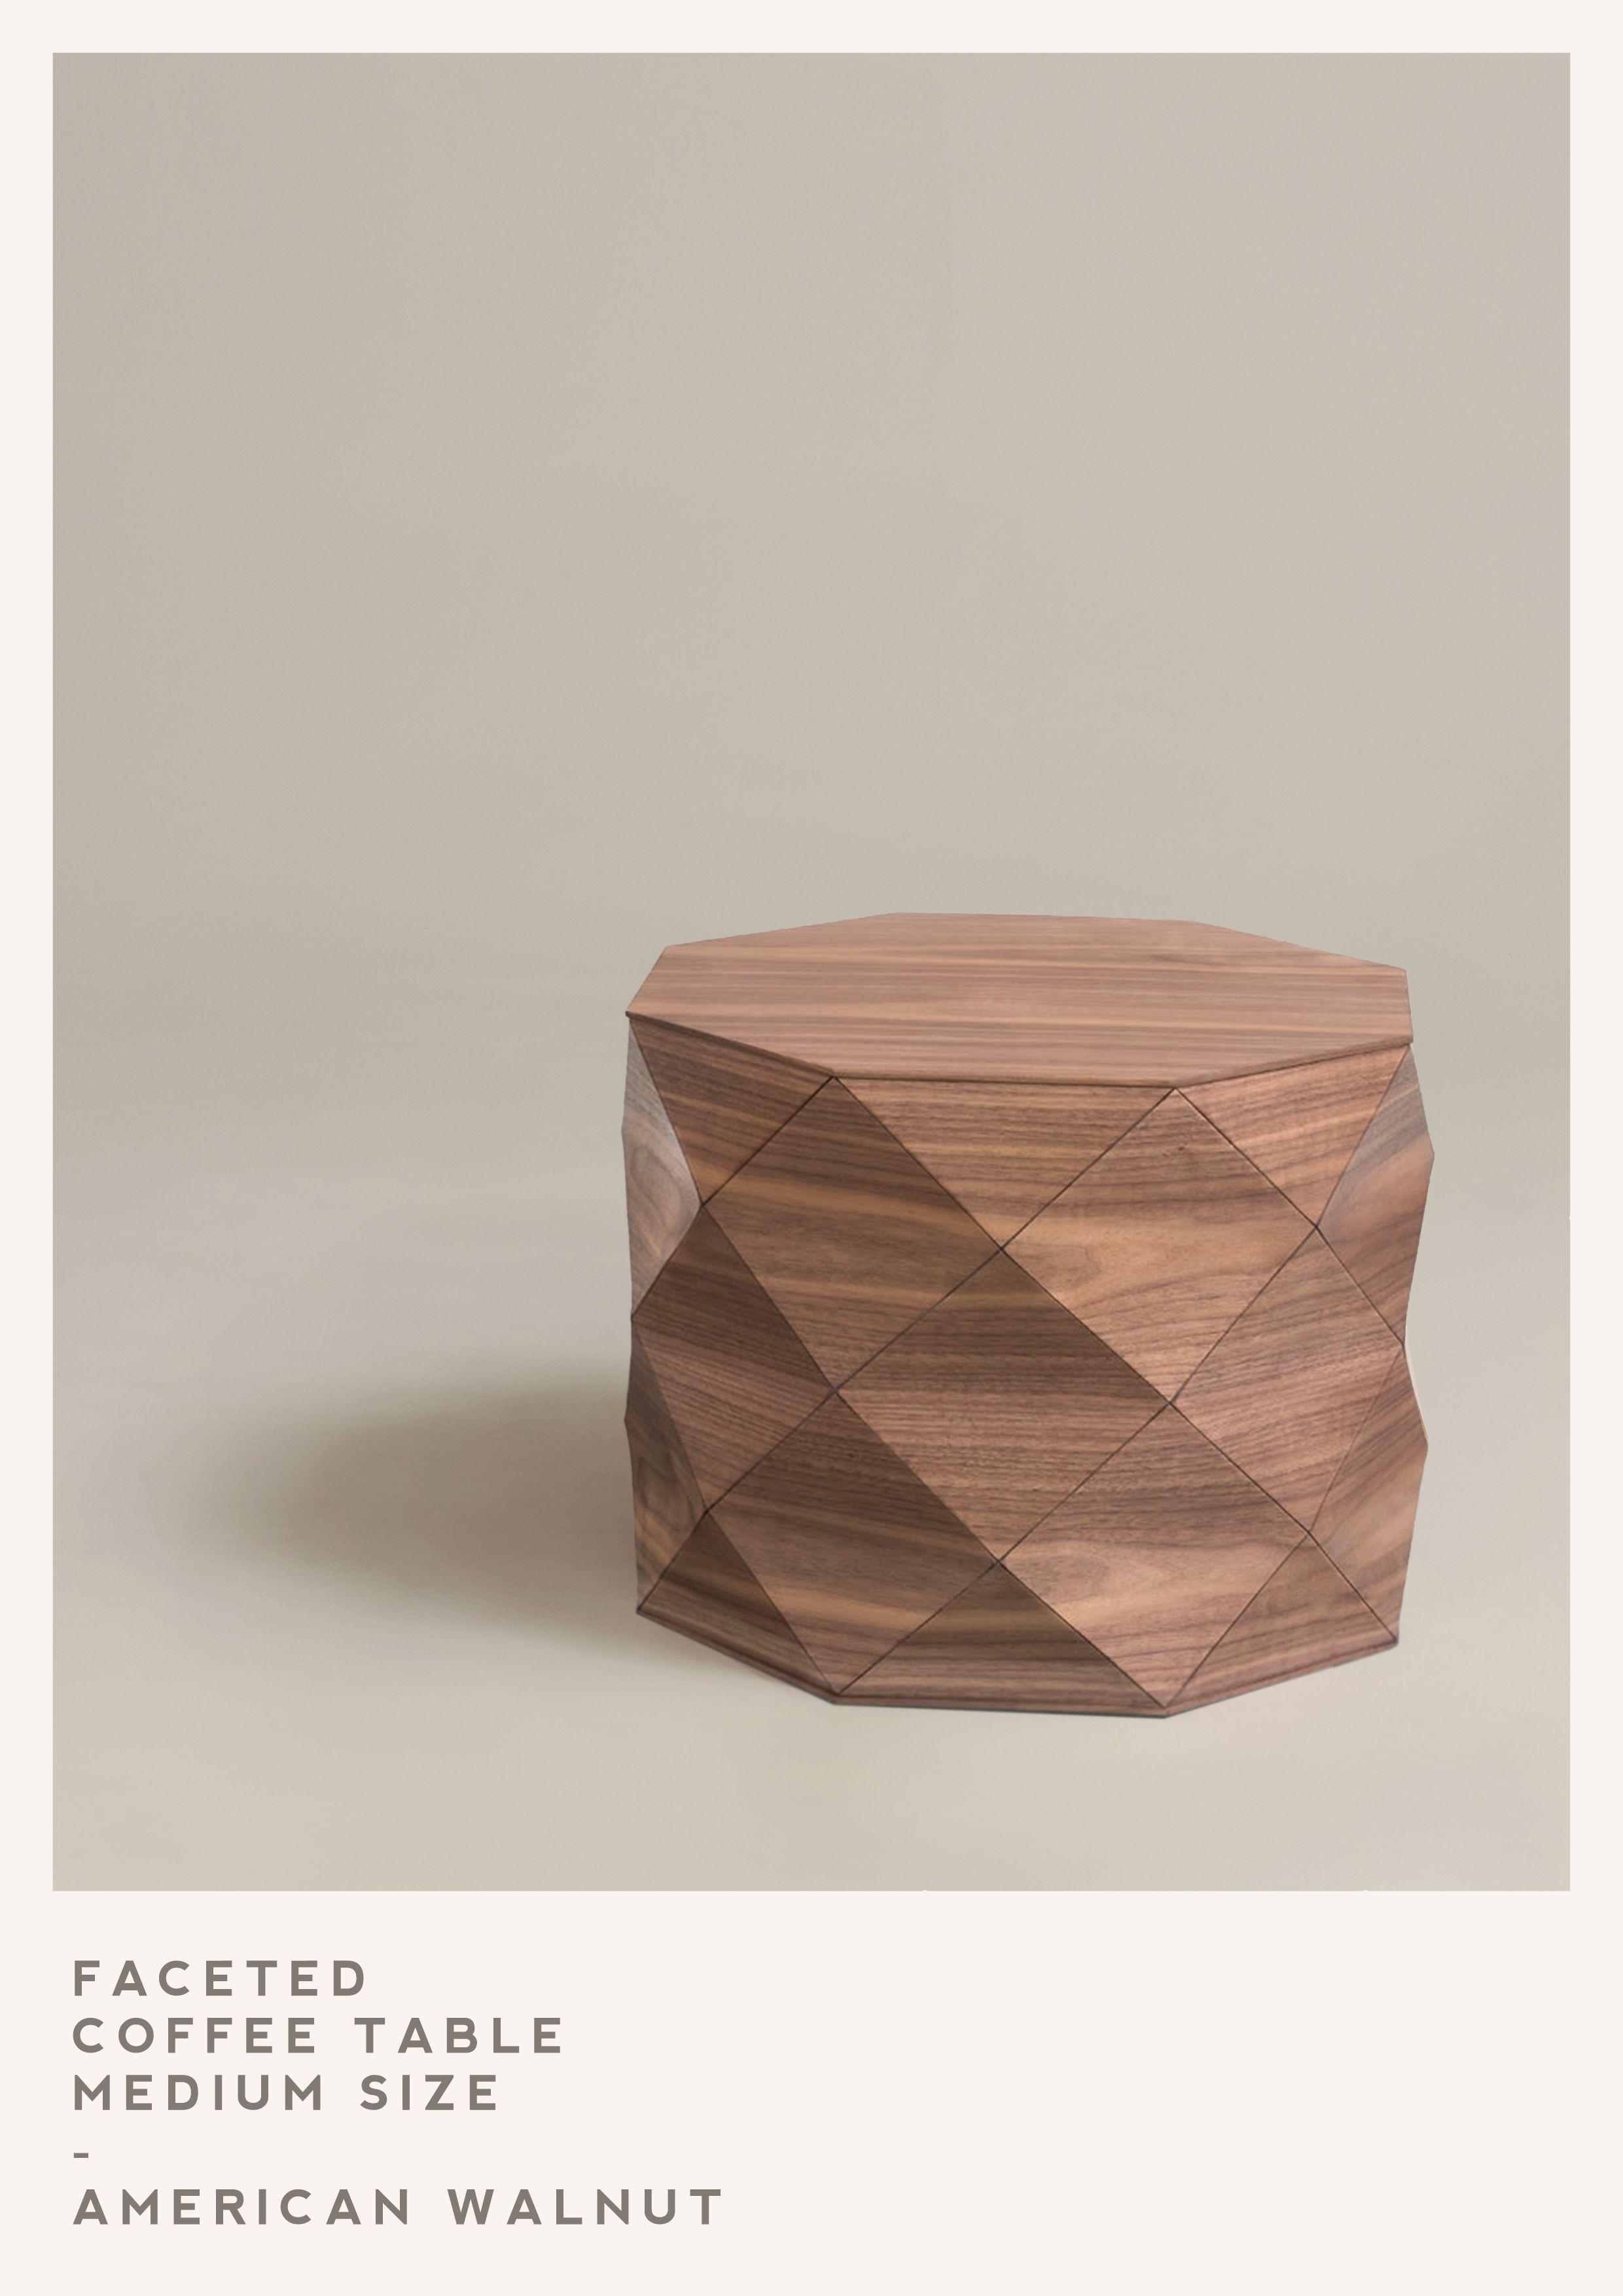 Medium American Walnut Coffee Table Handmade By Tesler Mendelovitch Wooden Accessories Walnut Coffee Table Wood [ 3508 x 2480 Pixel ]